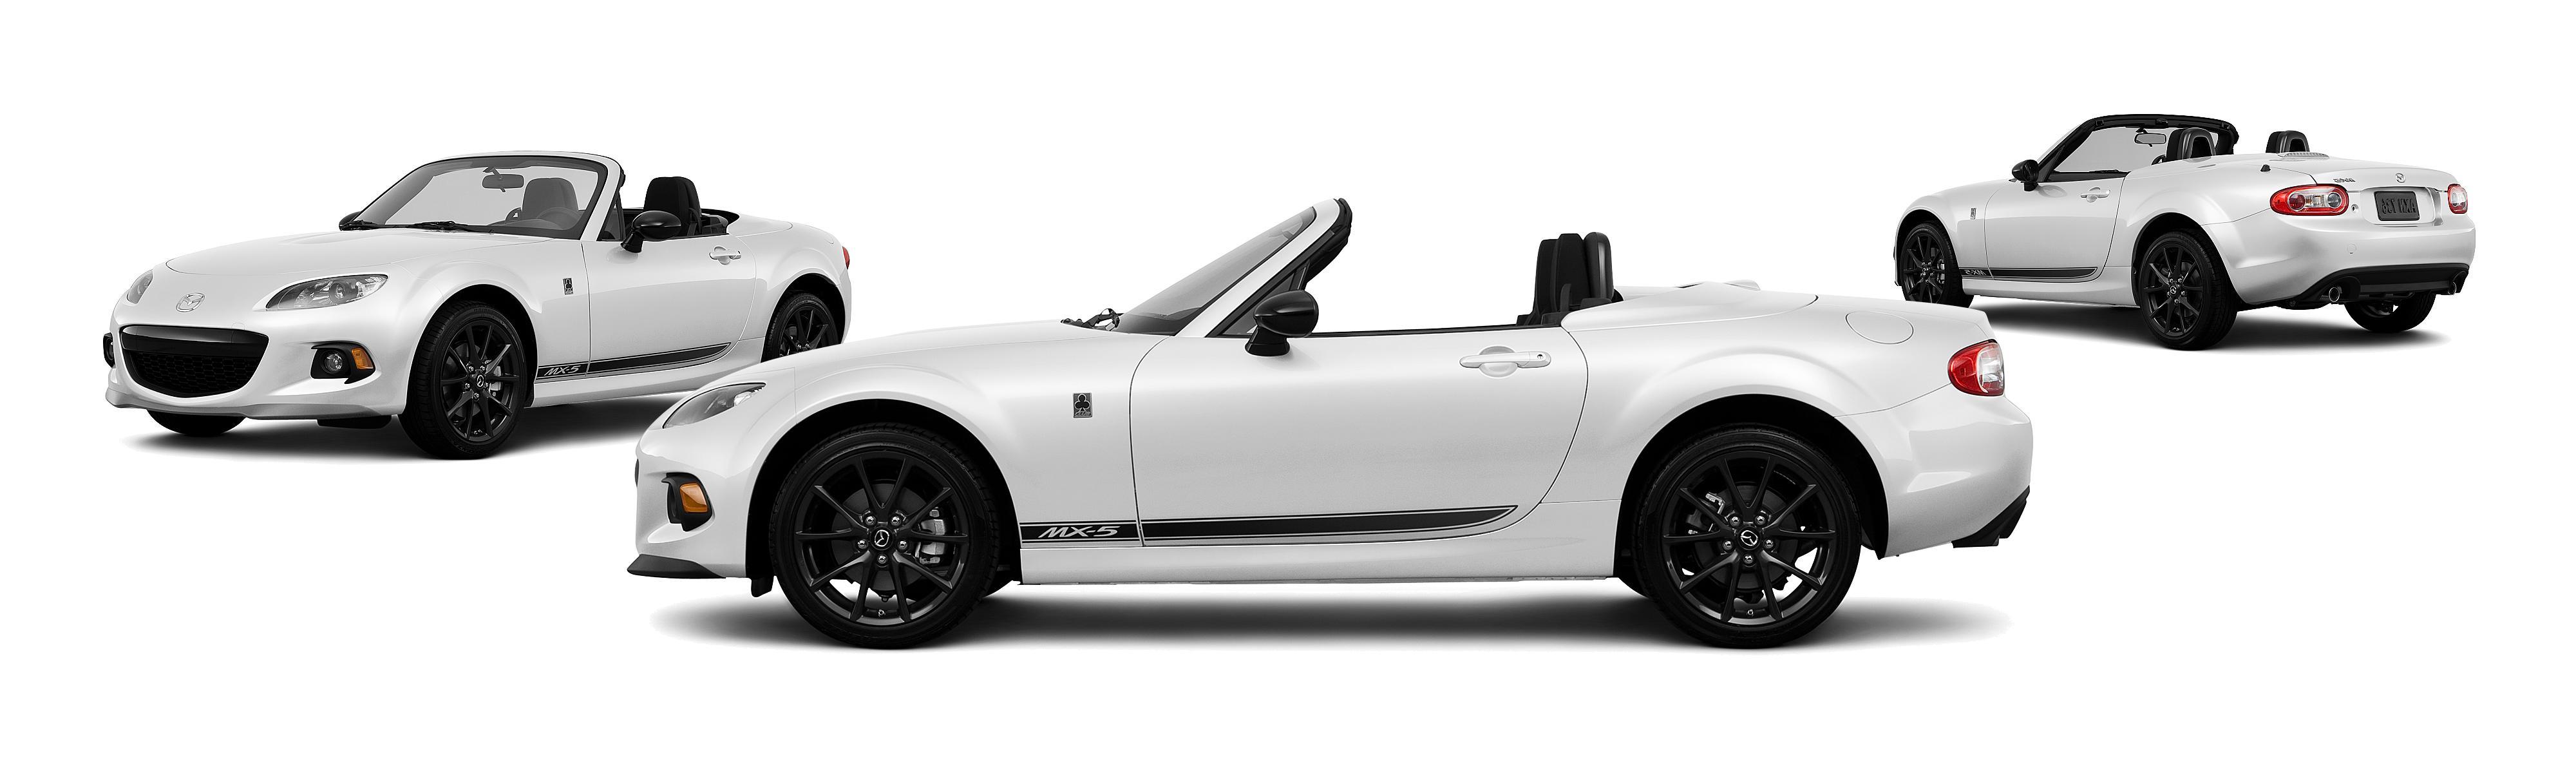 2013 mazda mx 5 miata club 2dr convertible 6m research groovecar